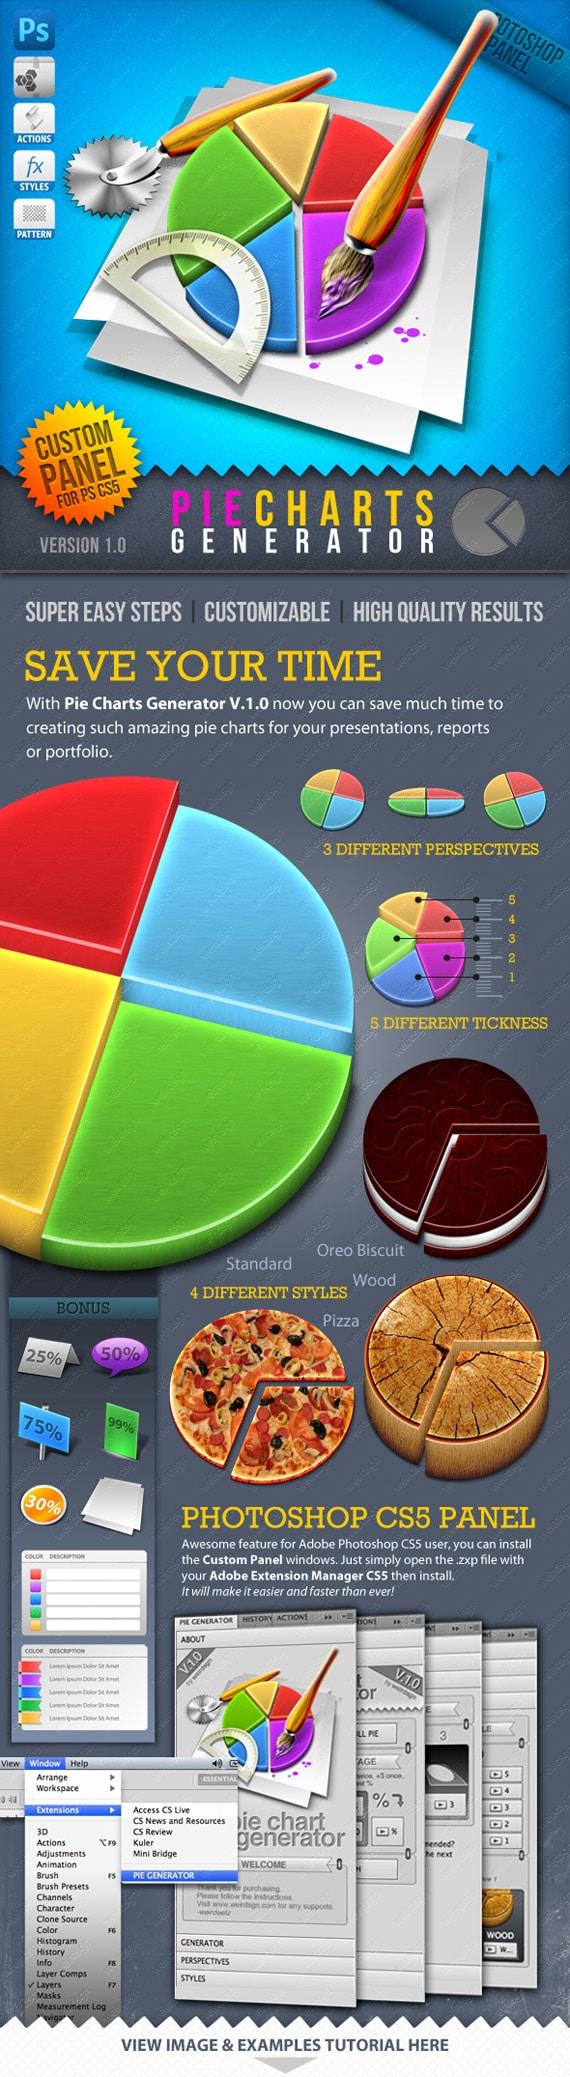 Infographic Tool Series: 3D Pie Charts Generator